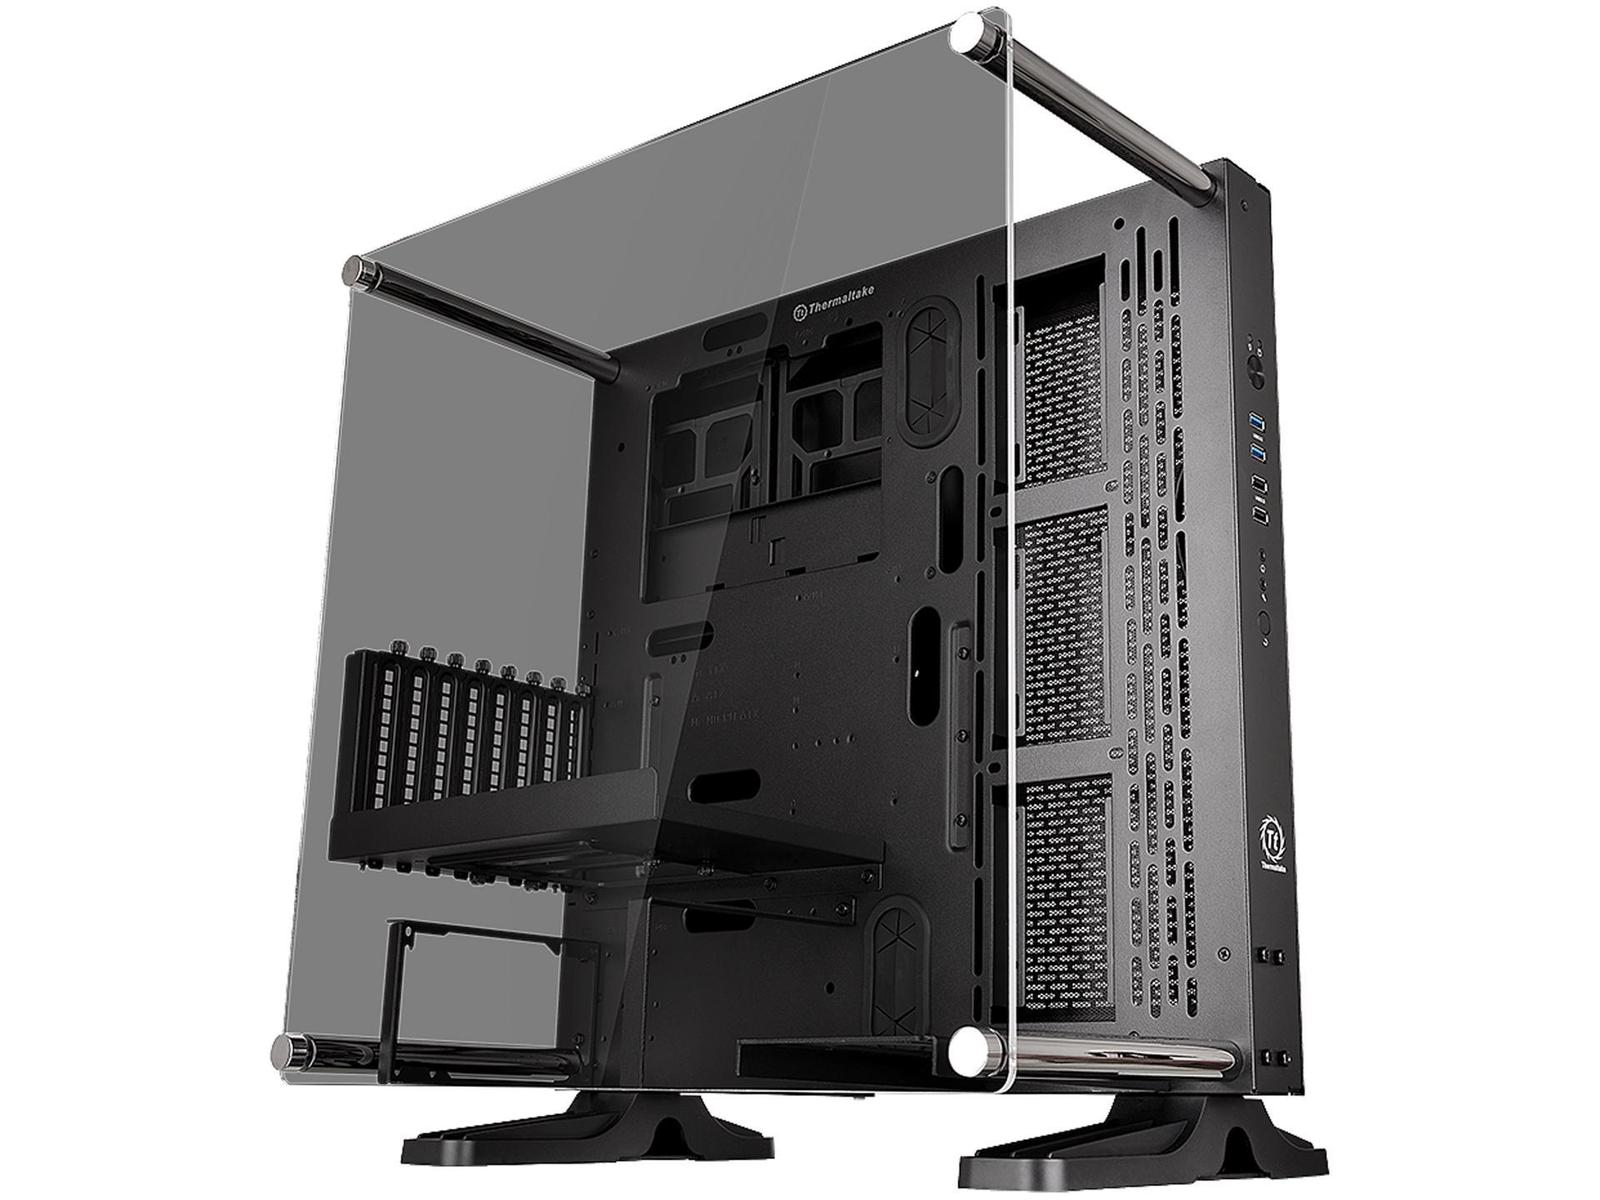 Thermaltake Core P3 ATX Mid Tower Case